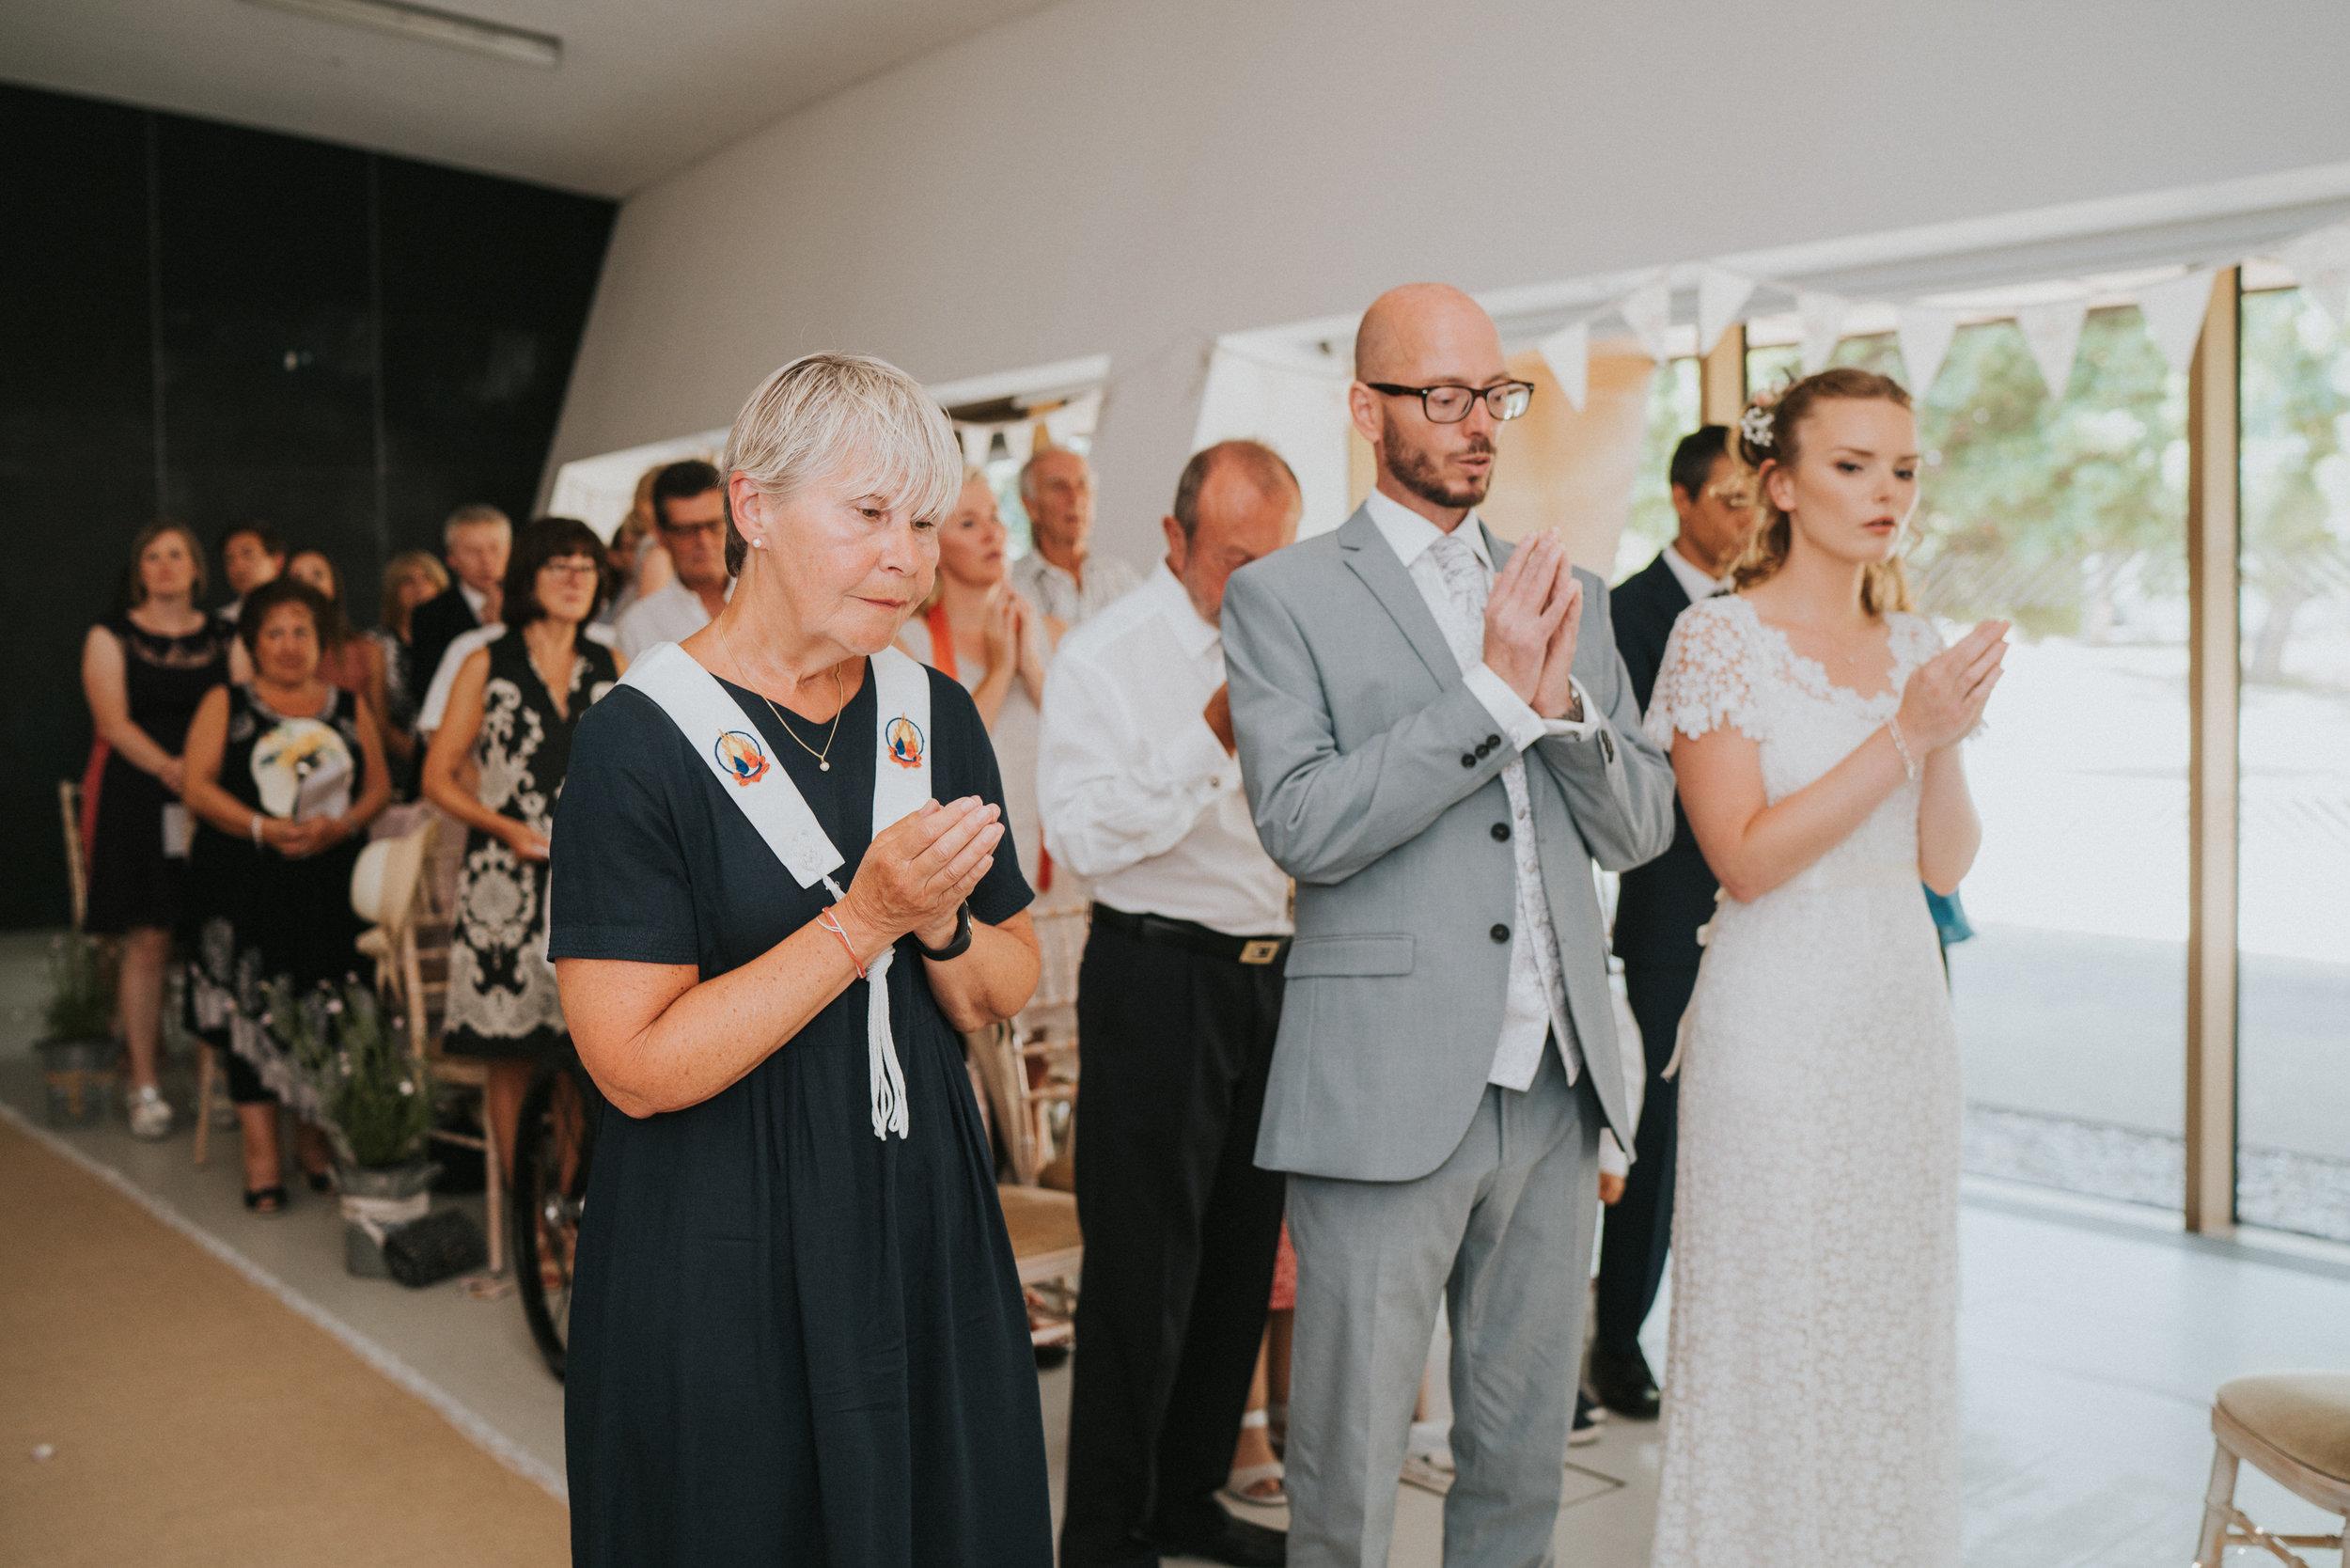 Grace-Elizabeth-Georgie-Amalaketu-Firstsite-Colchester-Essex-Boho-Buddhist-Wedding-Alternative-Wedding-Photography-Essex (48 of 100).jpg